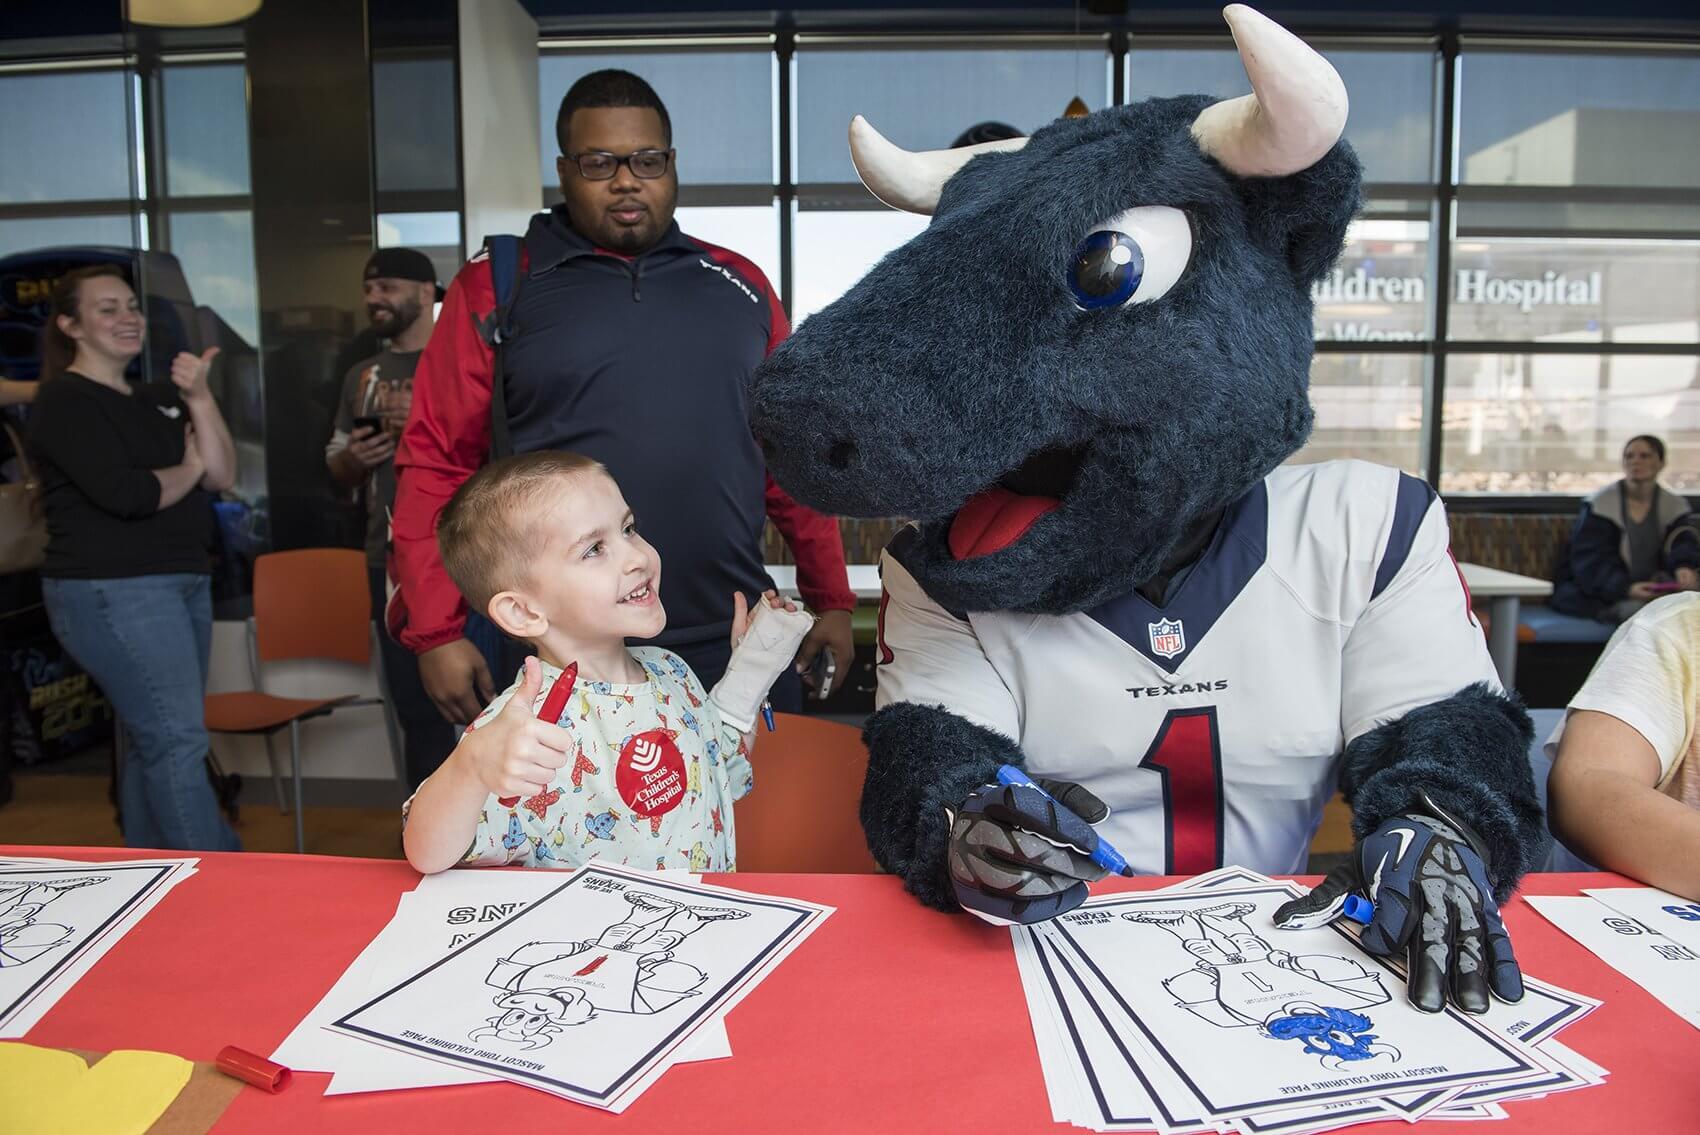 Jeremiah Greer gives Texans mascot Toro a big grin. (Credit: Allen S. Kramer/Texas Children's Hospital)